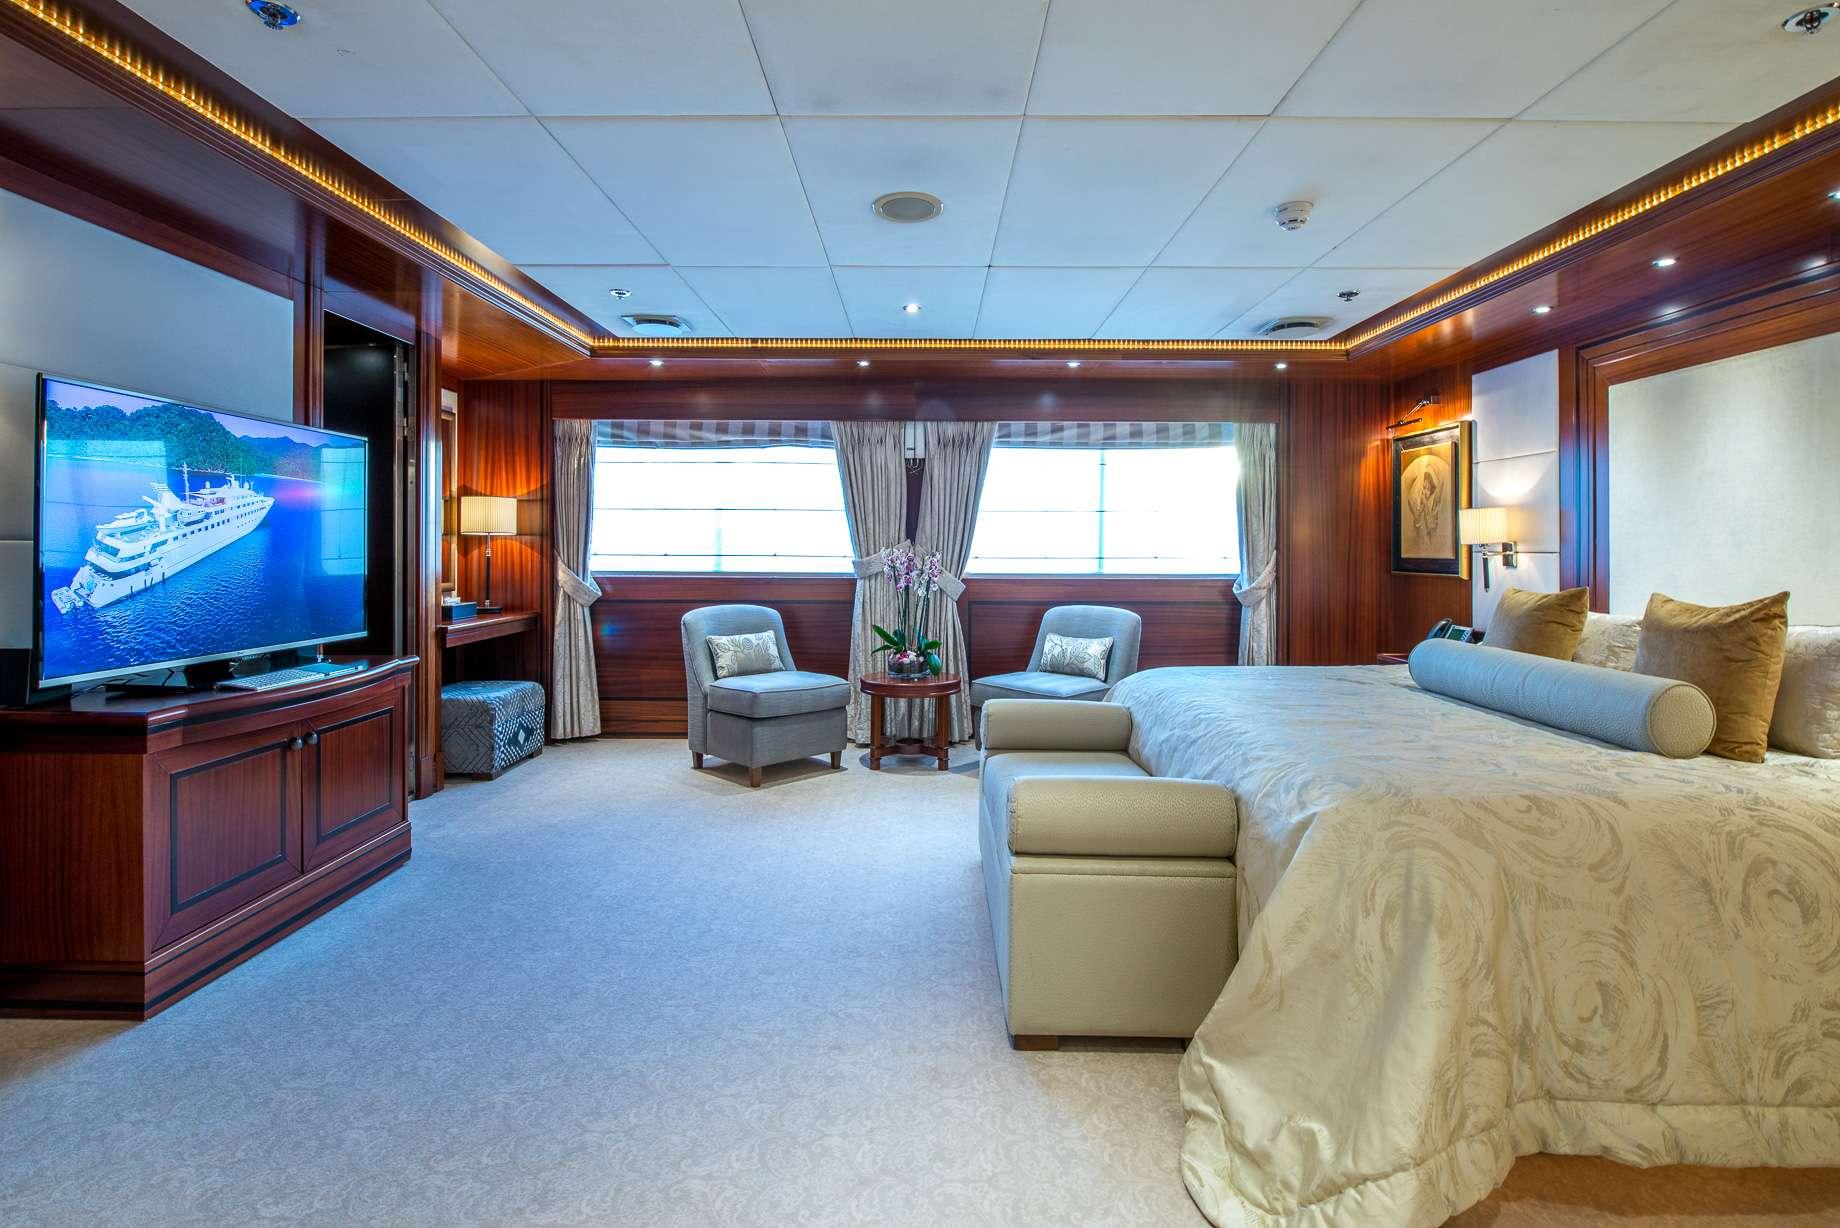 Motor Yacht 'LAUREN L' Master Stateroom, 40 PAX, 295.00 Ft, 90.00 Meters, Built 2002, Cassens Werft, Refit Year 2008/2015